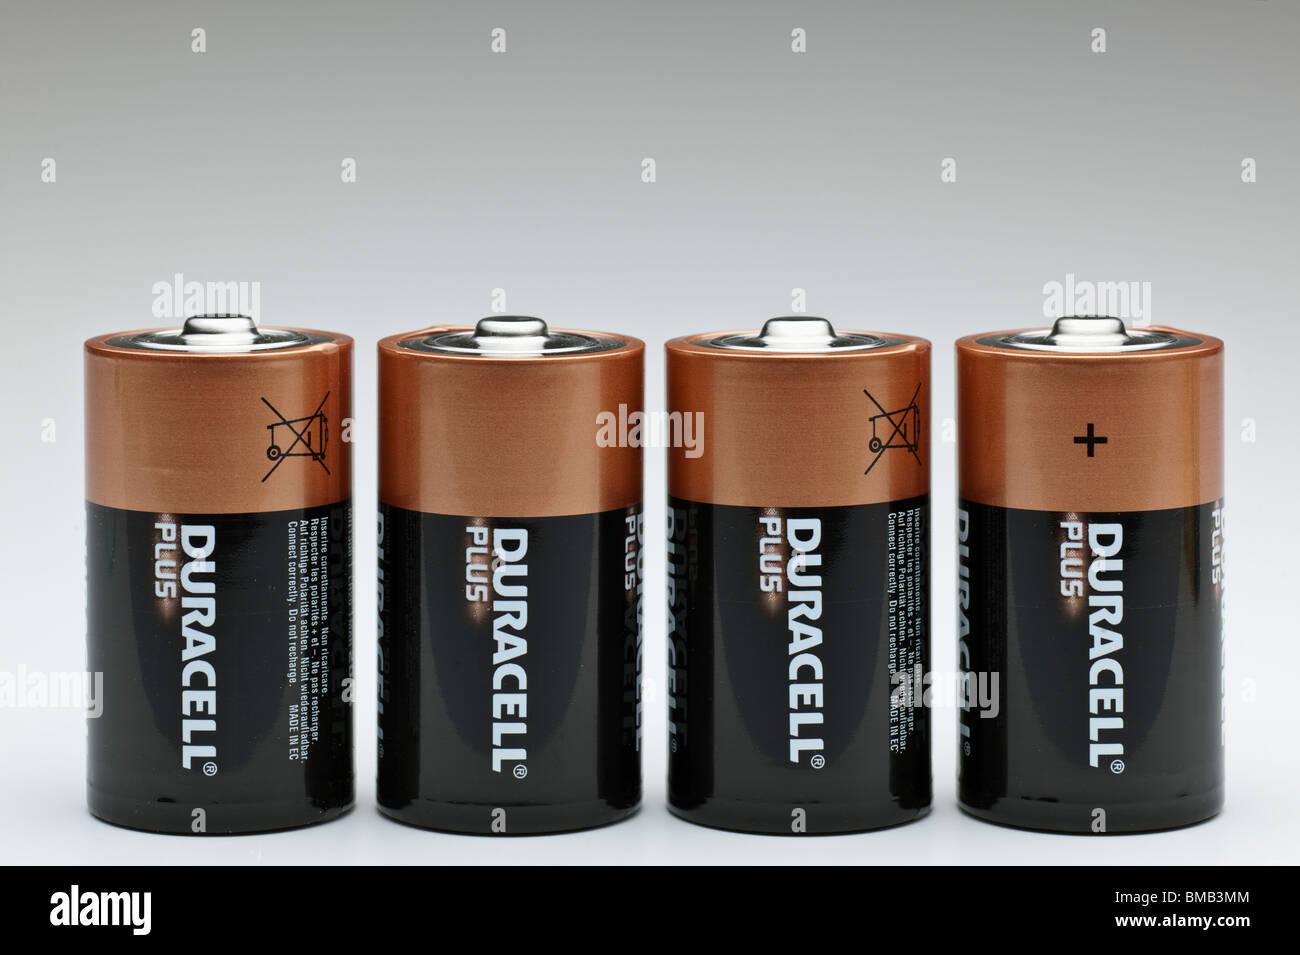 Four Duracel Plus LR20 mn1300 1.5v alkaline batteries - Stock Image